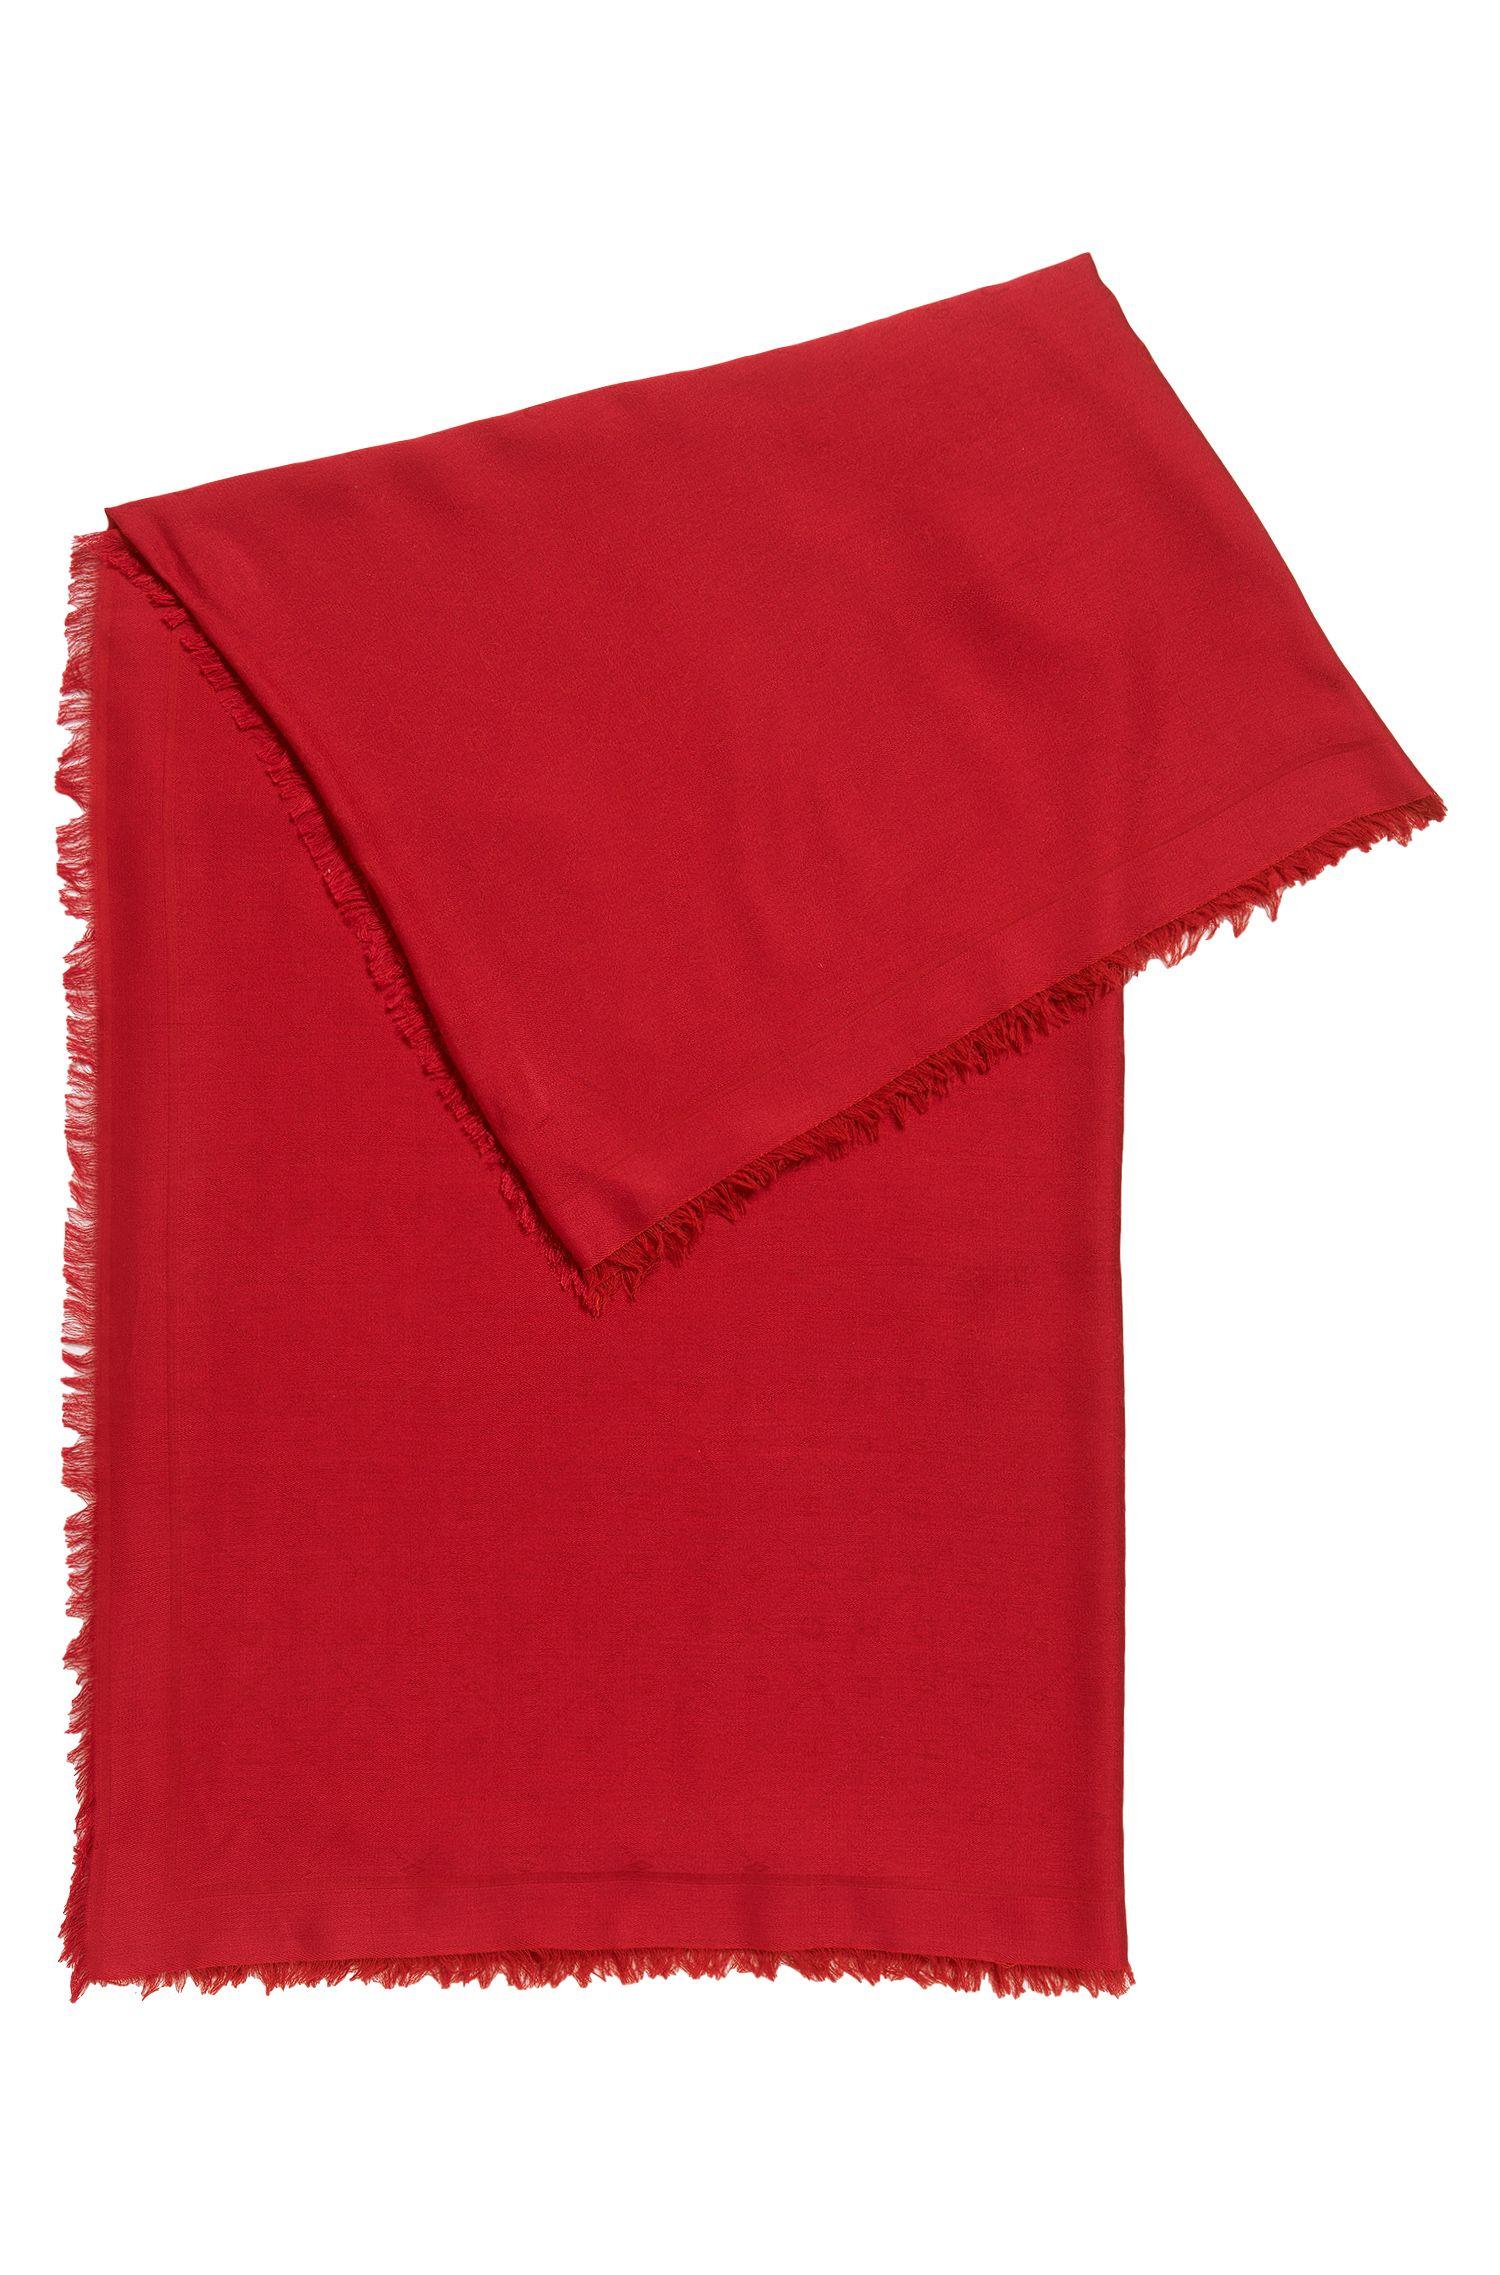 Jacquard-Schal mit Ton in Ton gehaltenem Logo-Muster